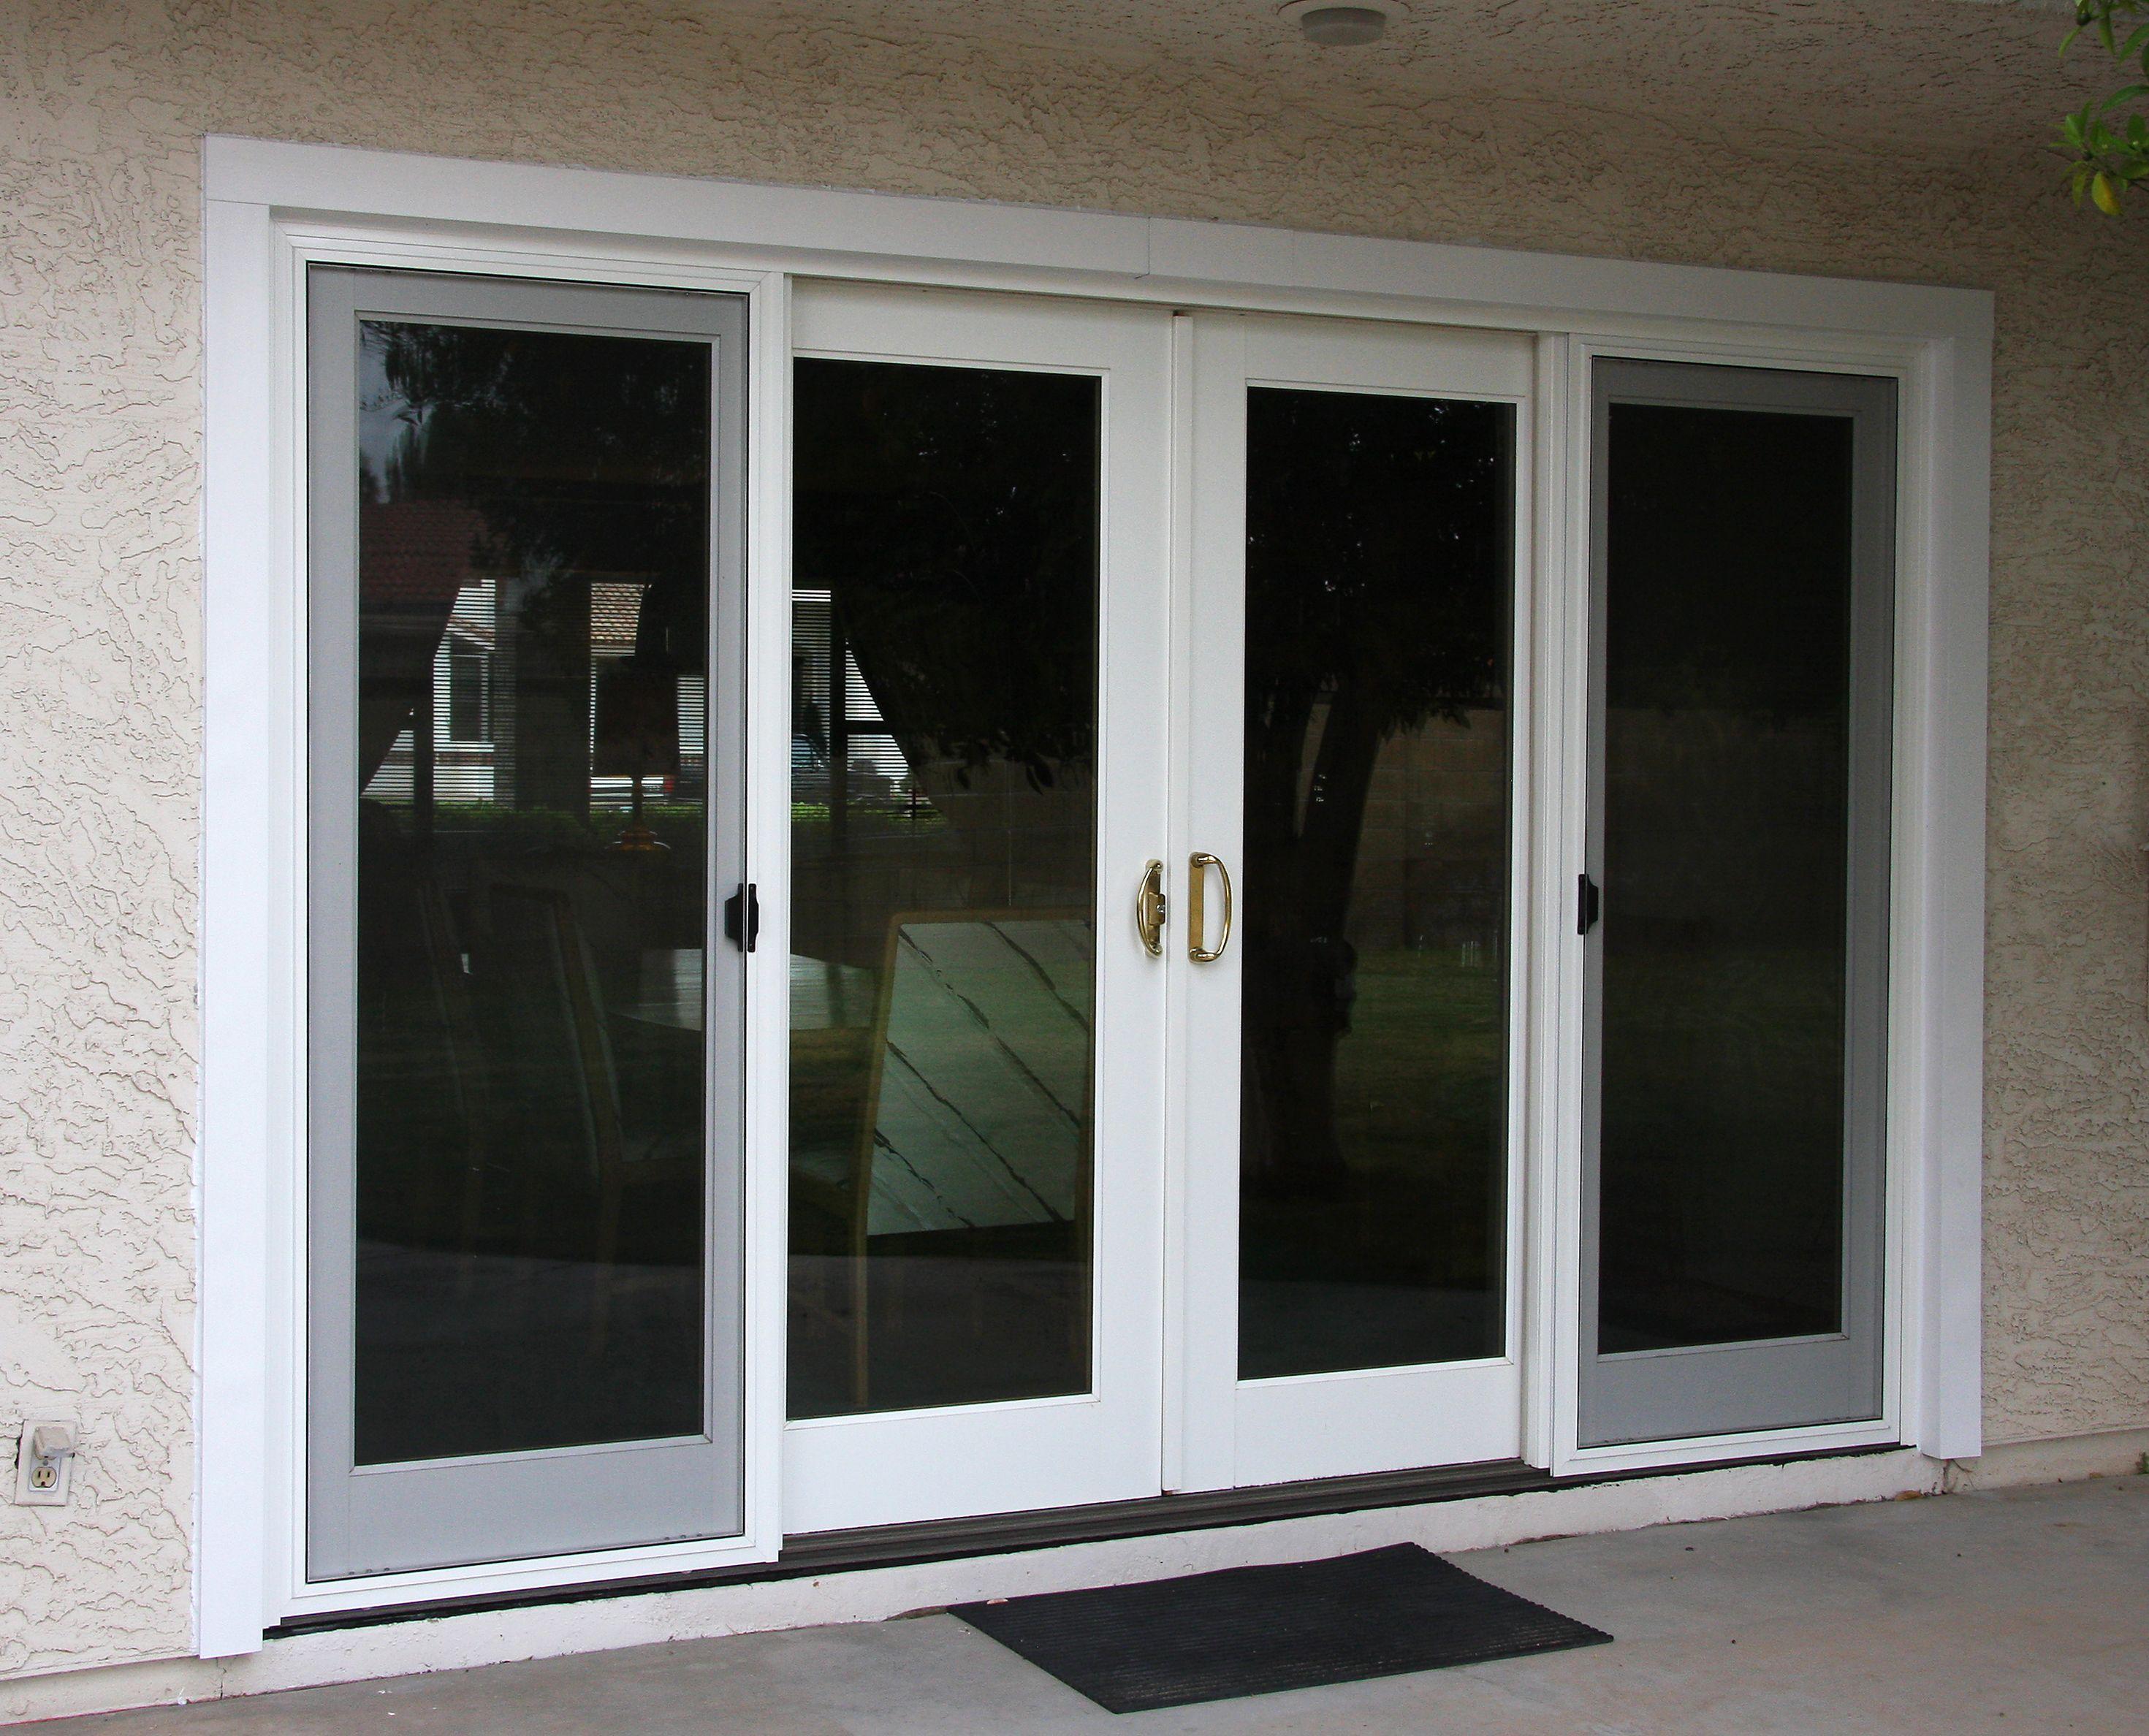 Energy Efficient Replacement Windows In Phoenix French Doors